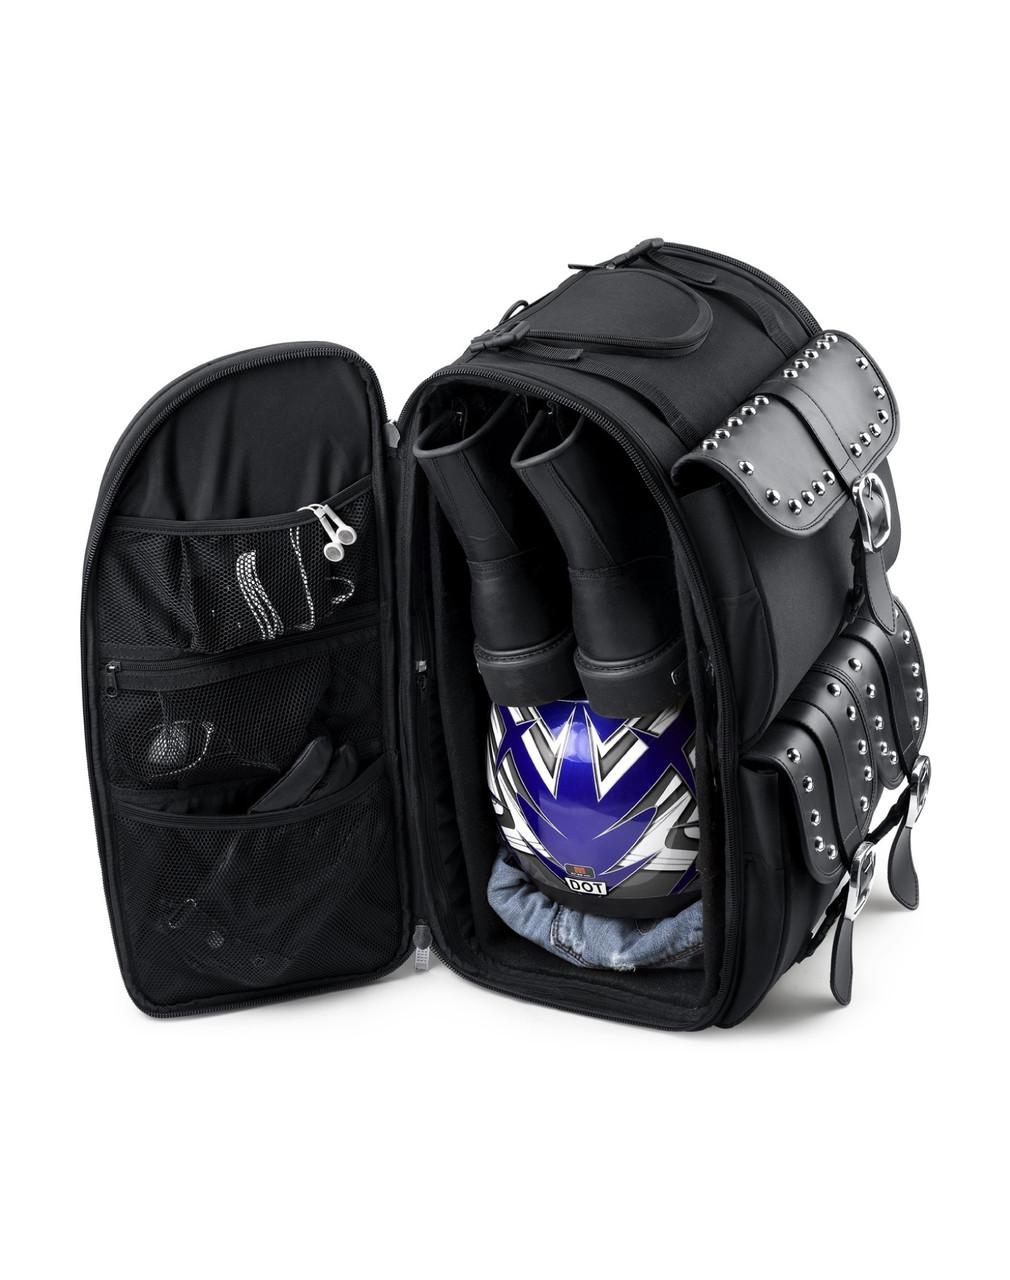 Harley Davidson Viking Extra Large Studded Motorcycle Tail Bag Storage View